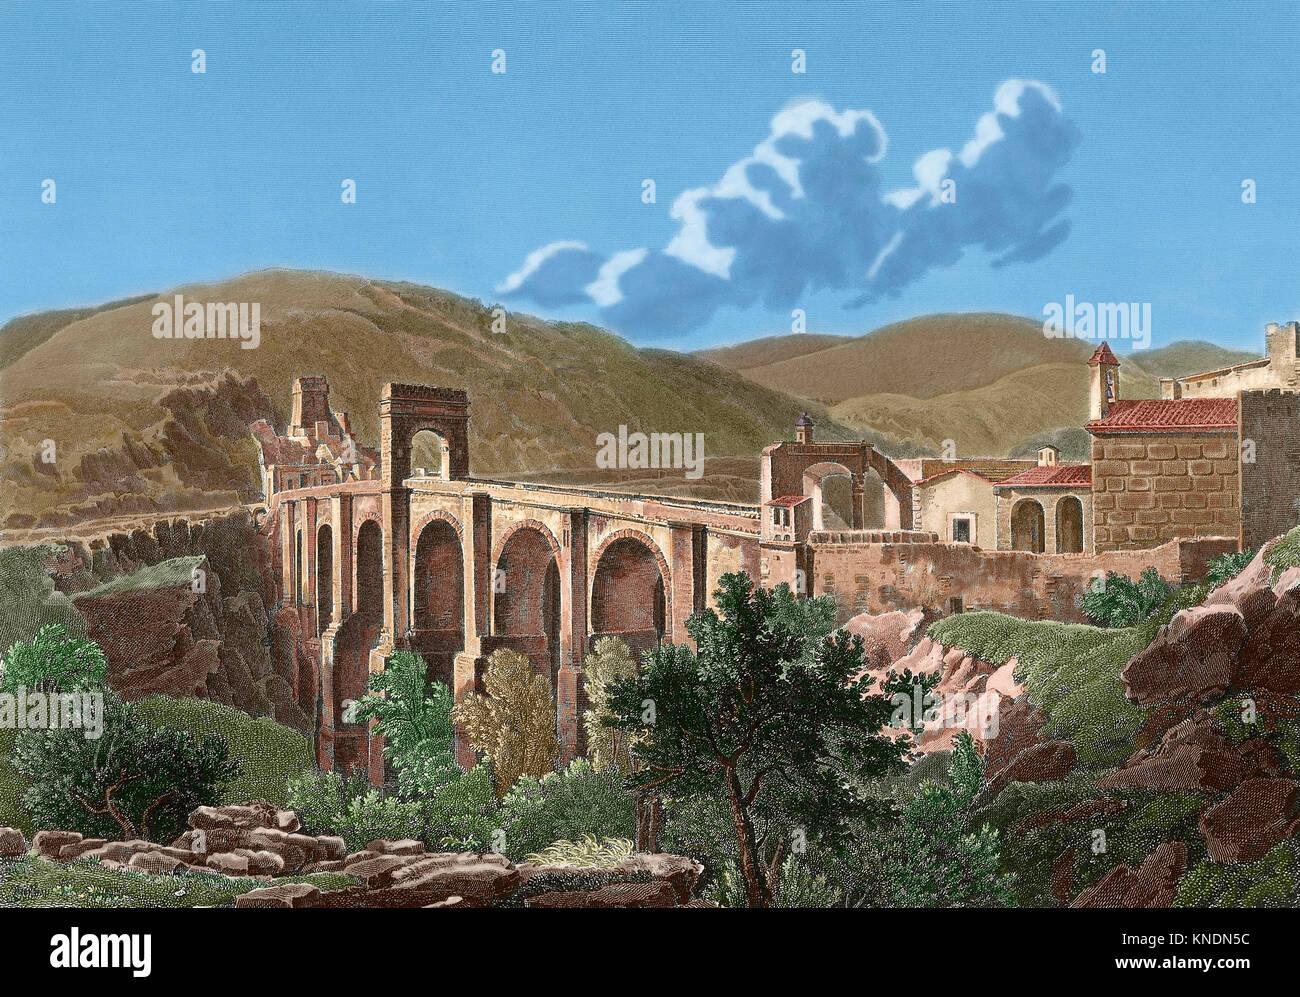 Spain. Extremadura. The Alcantara Bridge, also known as Trajan's Bridge at Alcantara. Roman stone arch bridge - Stock Image